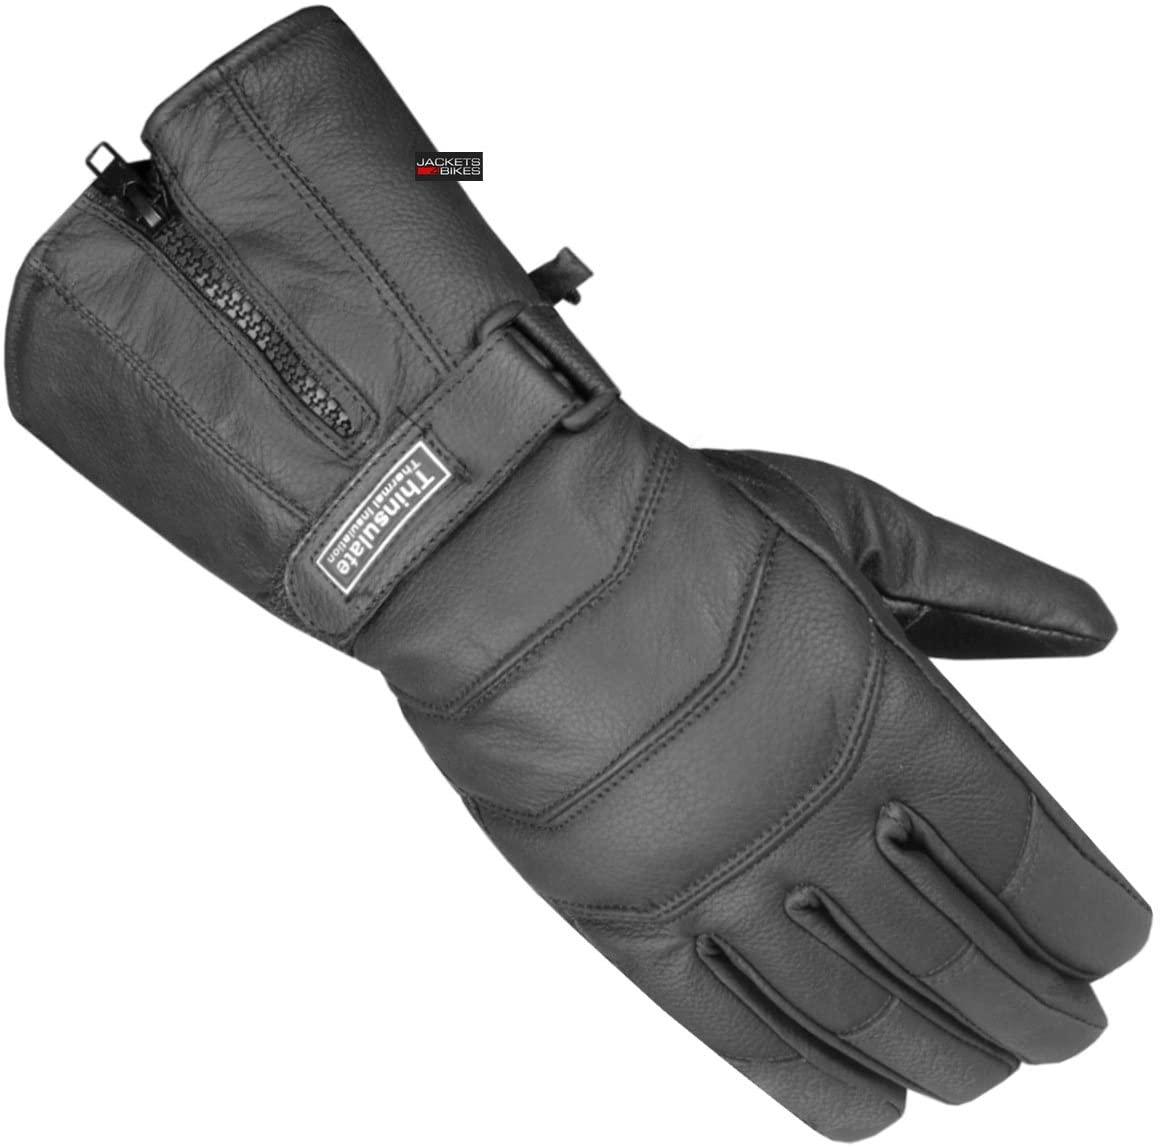 Men's Thermal Sheep Leather Winter Motorcycle Street Cruiser Gloves Black L